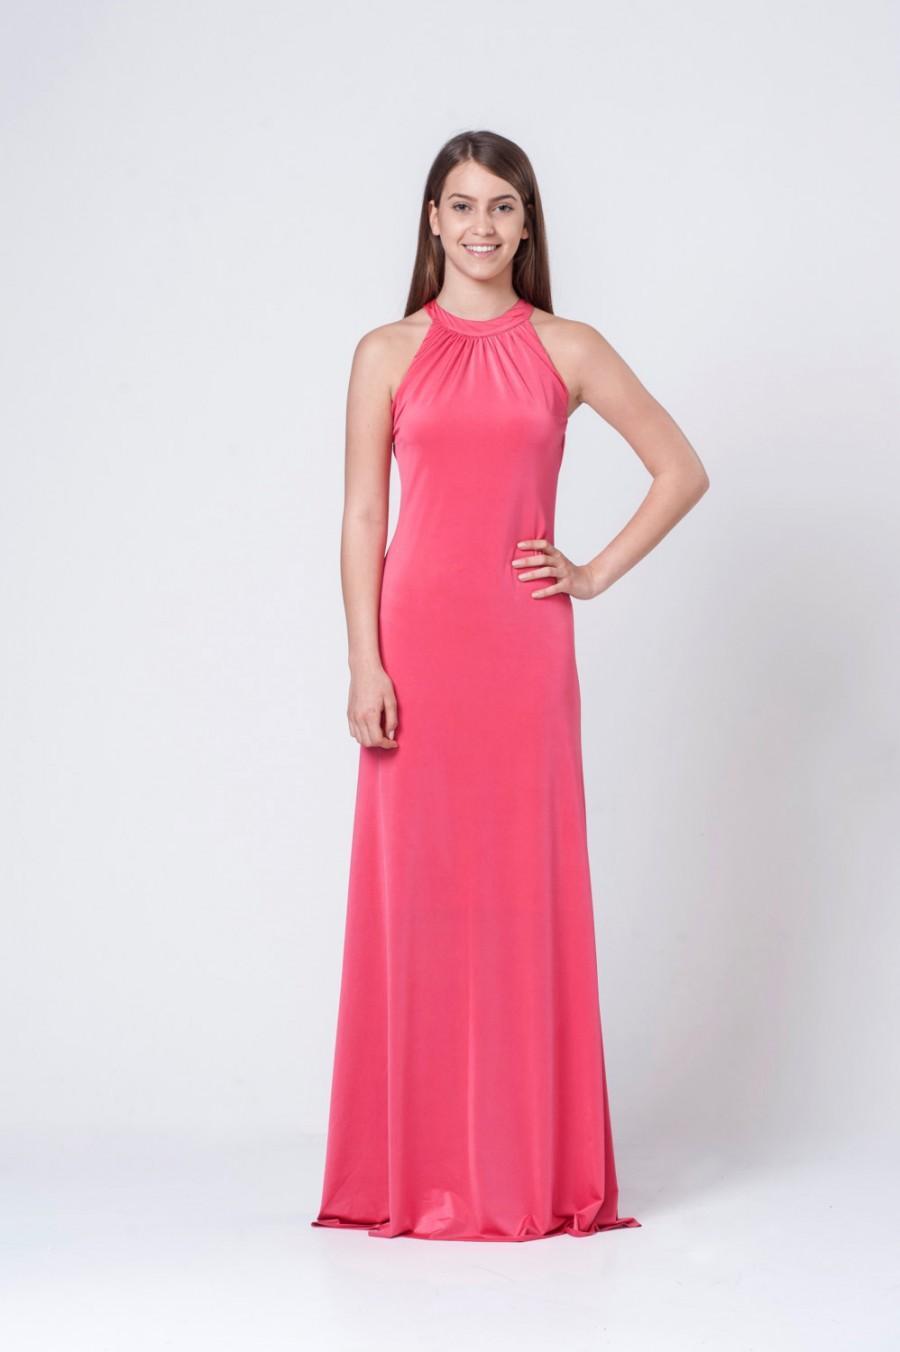 e0f4fc509a Coral pink Halter neck dress - Coral pink back opening bridesmaid maxi dress  - Coral pink off Shoulders maxi dress